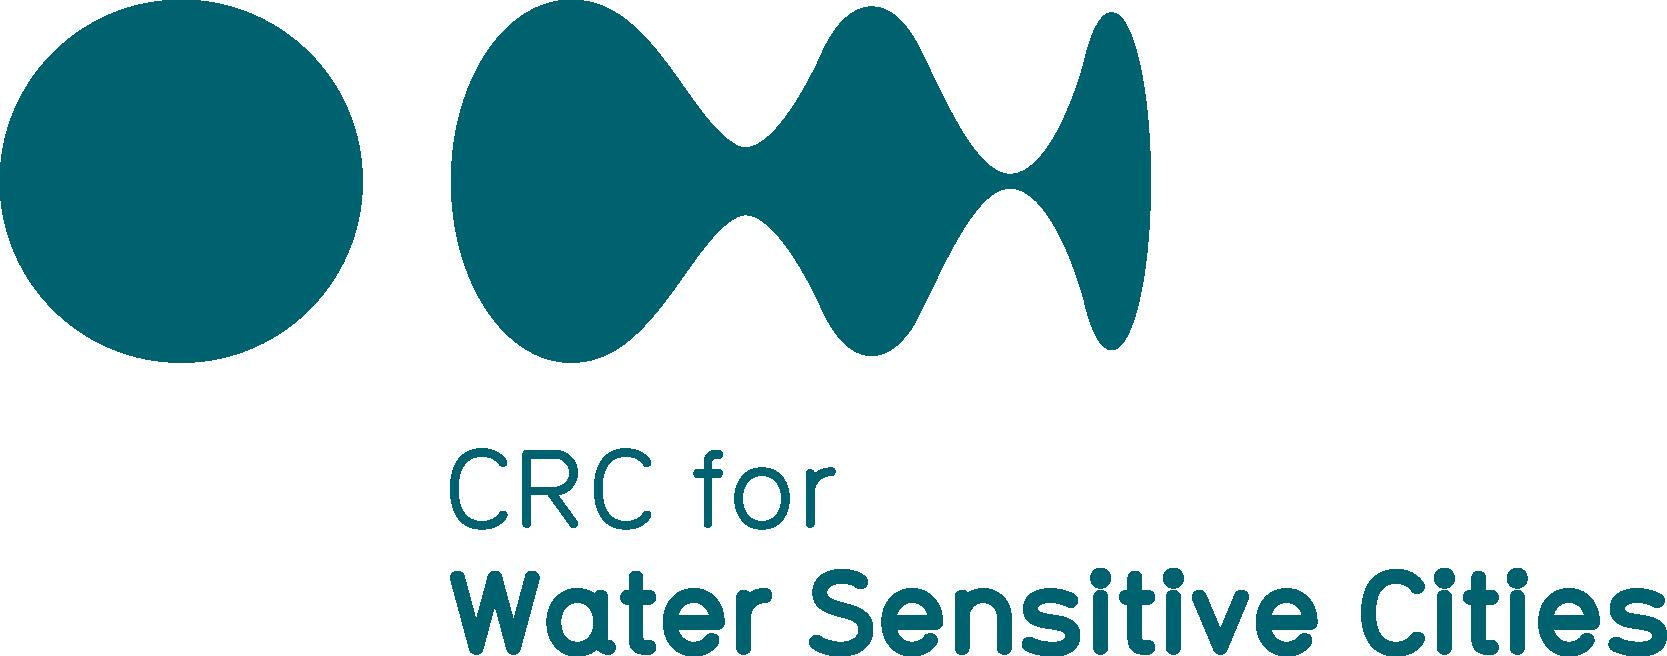 CRC-WSC_logo_compact